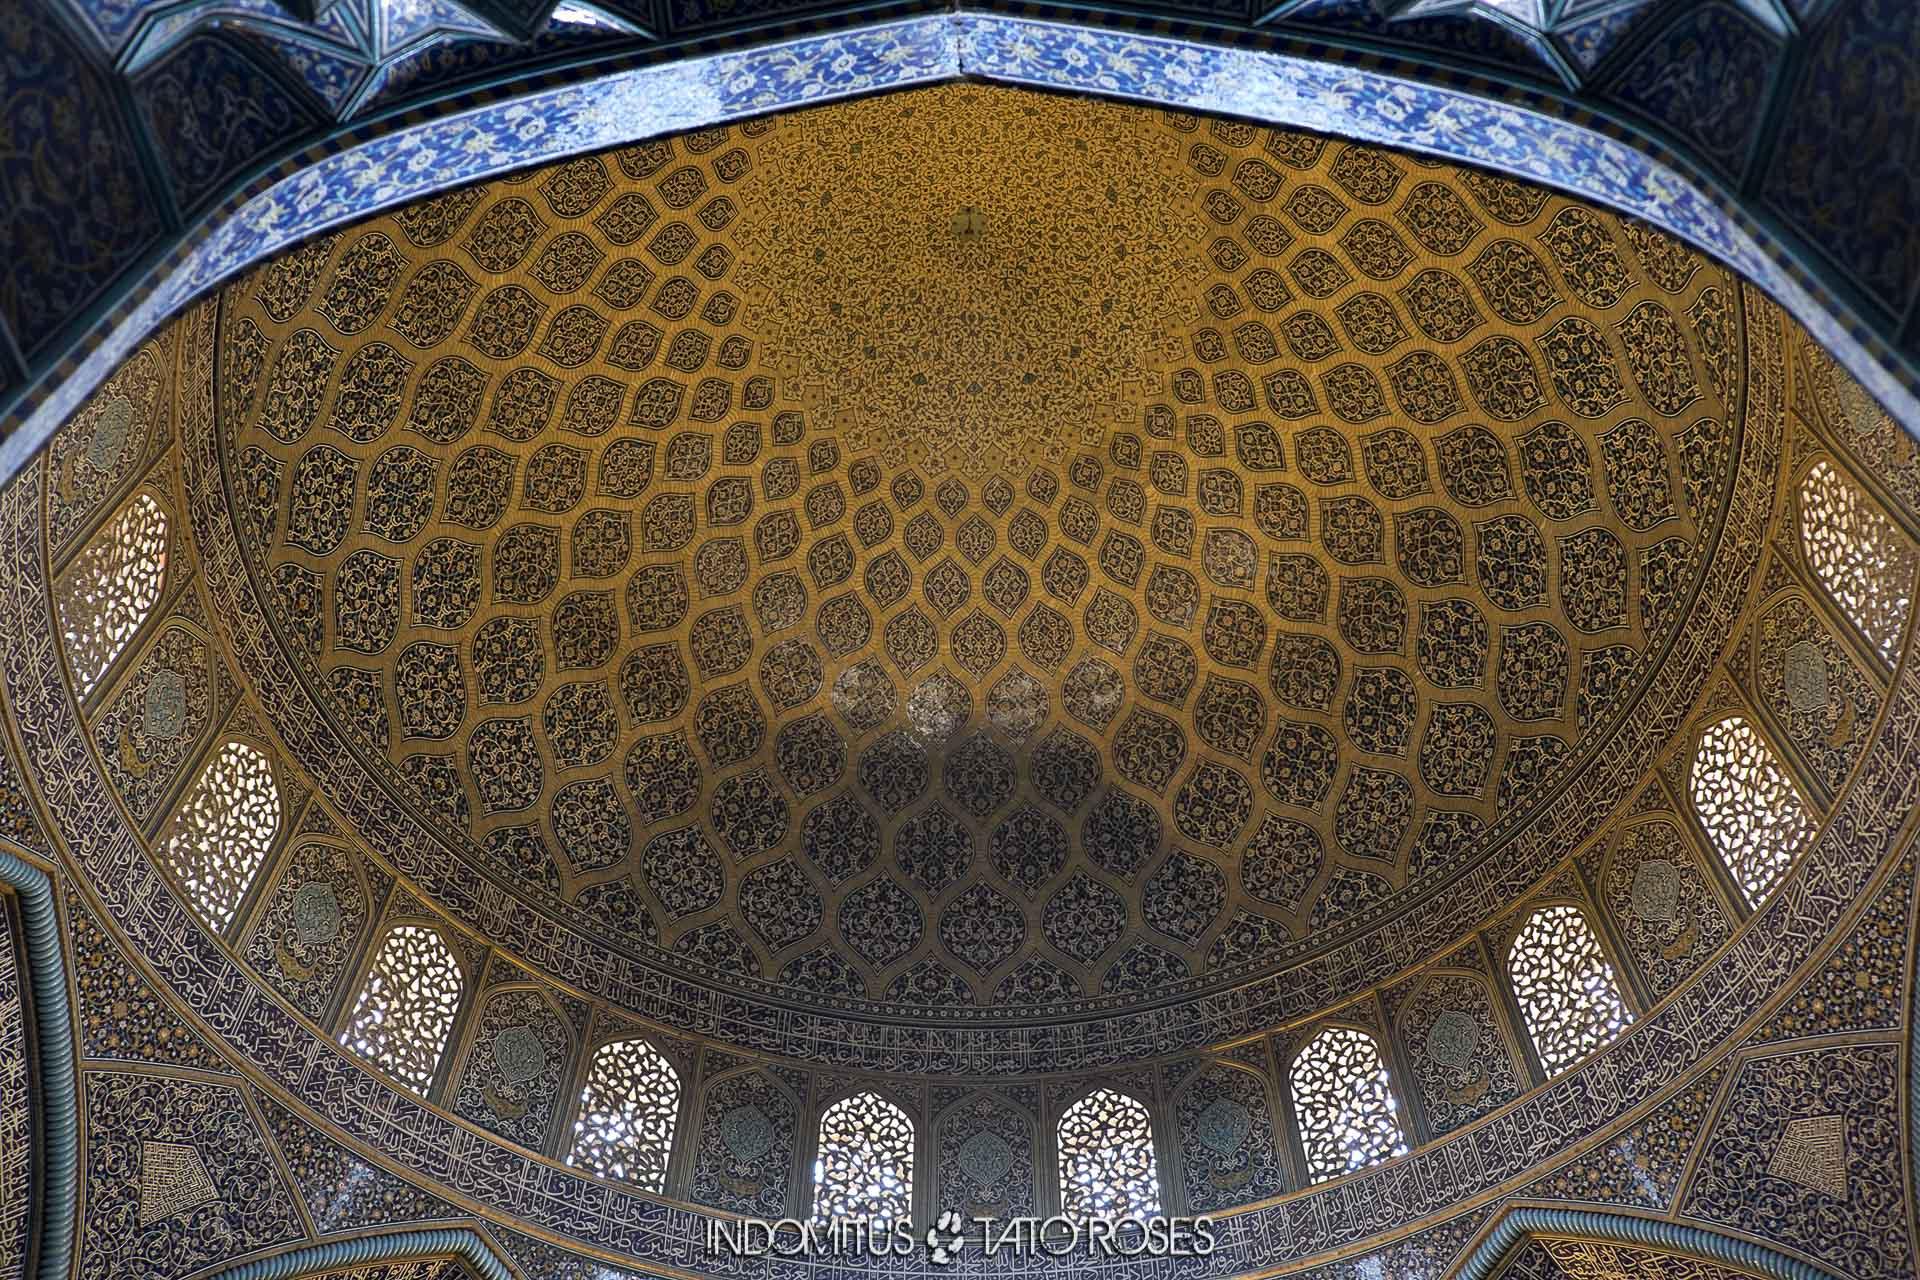 Irán 295 Mezquita del jeque Lotf Allah Naghsh i Jahan Isfahan